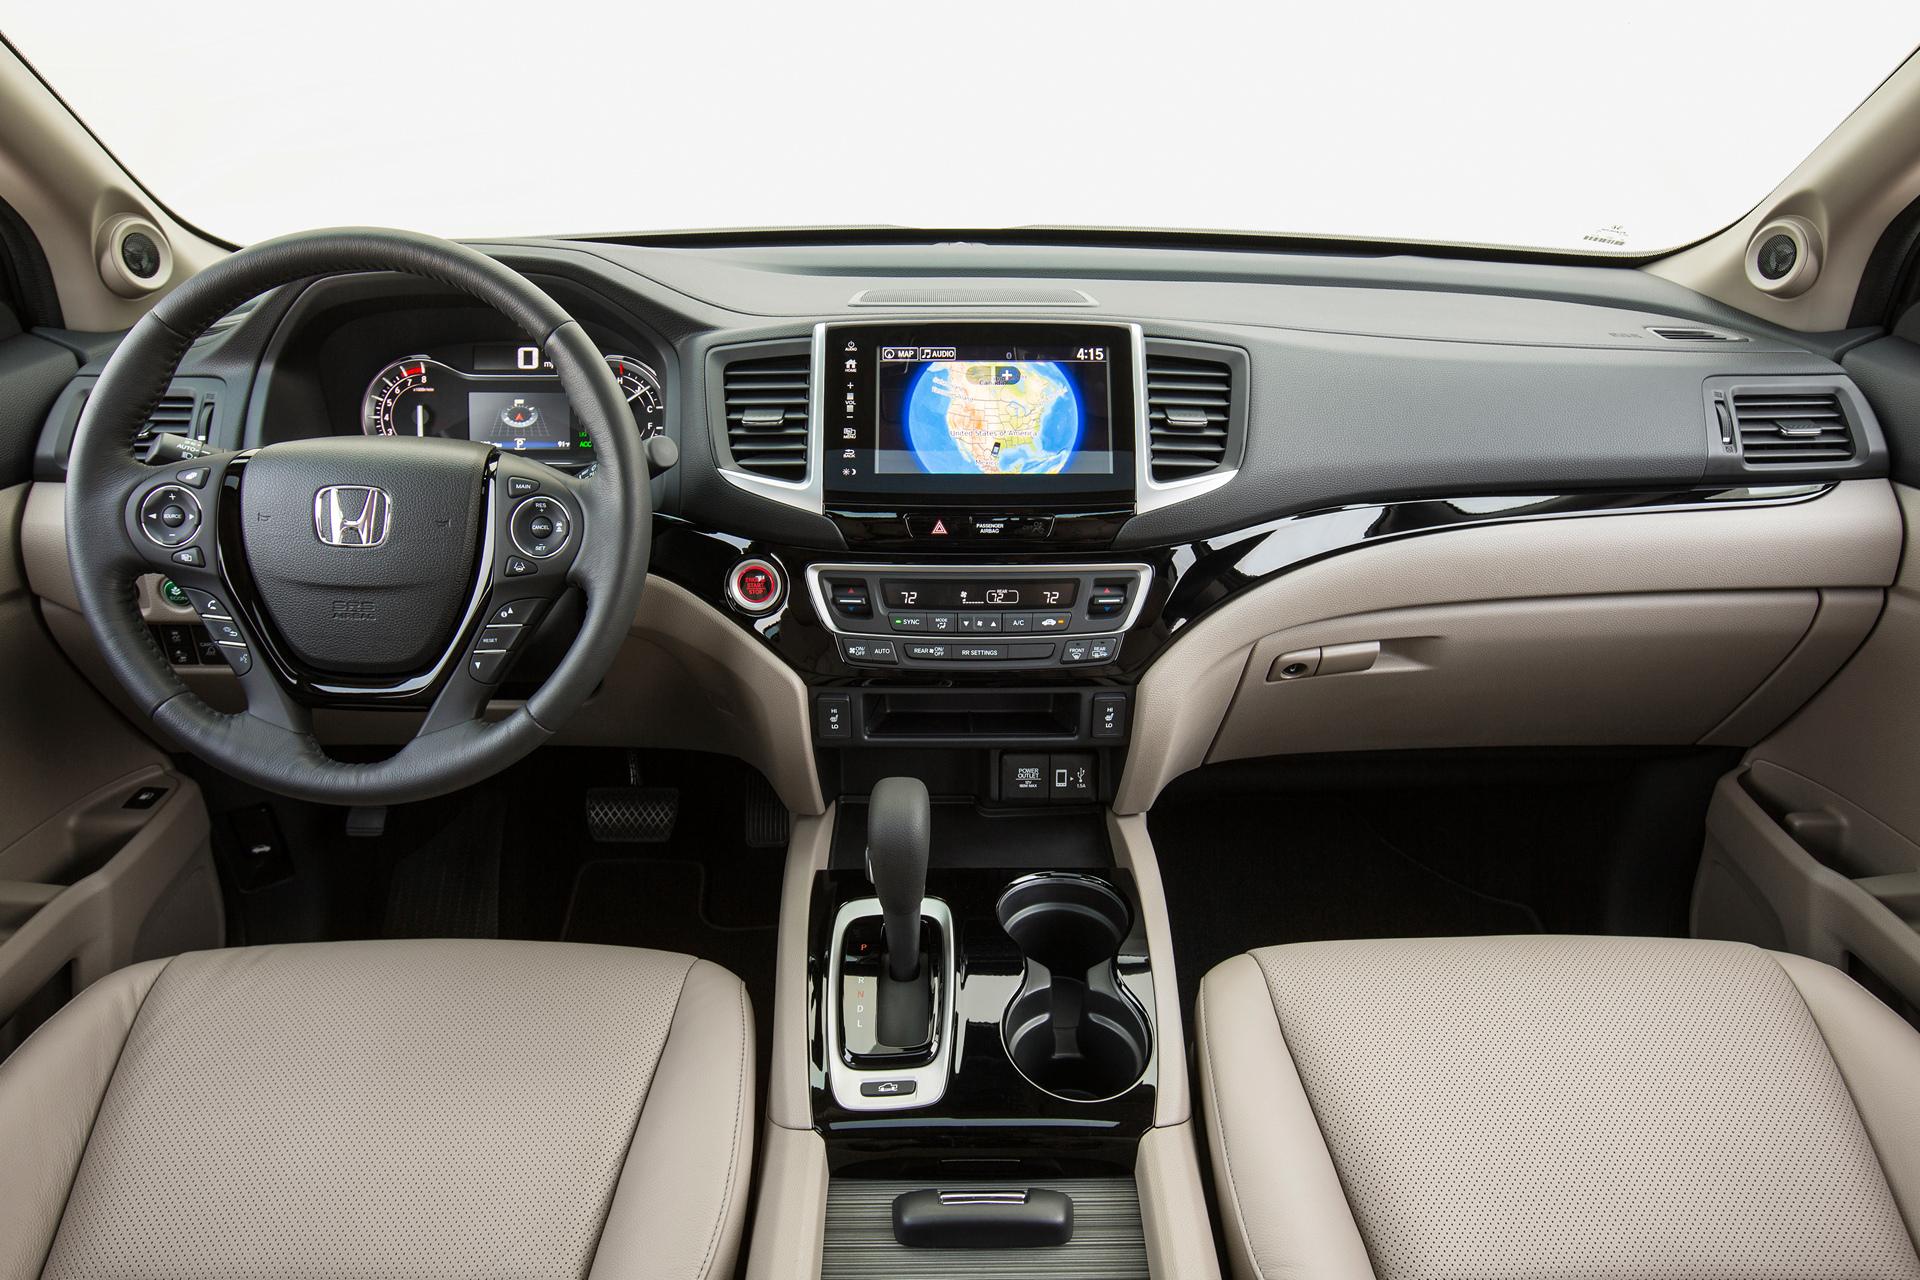 2017 honda ridgeline preview carrrs auto portal - 2017 honda ridgeline rts interior ...